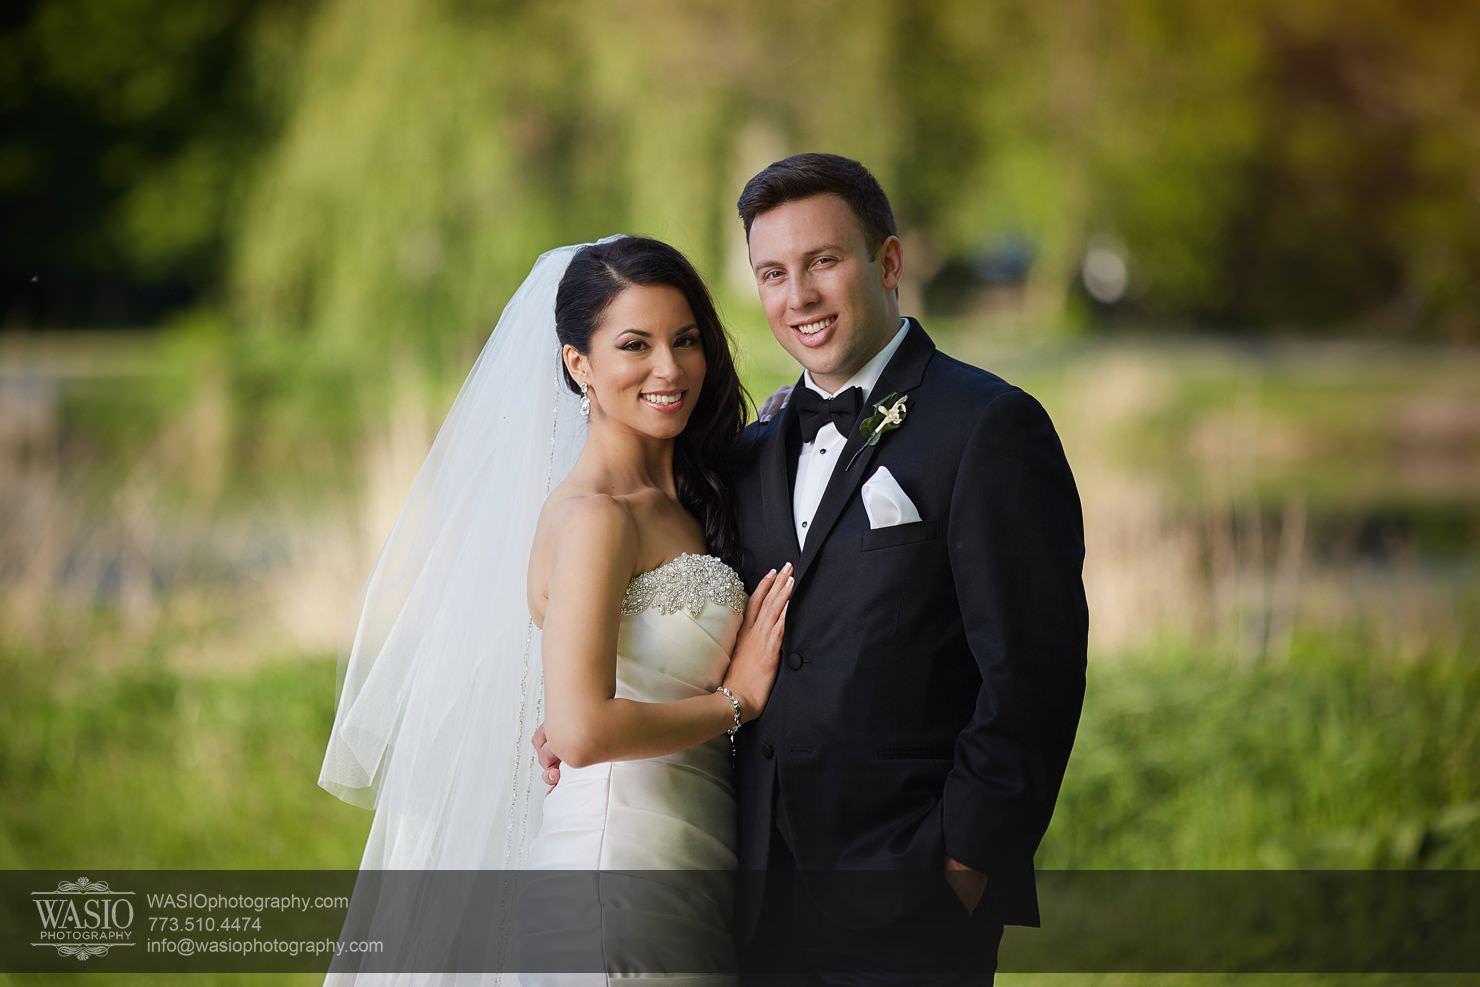 037_Chicago-Spring-Wedding_Chrissy-Andrew_3P4C6101 Chicago Spring Wedding - Chrissy + Andrew